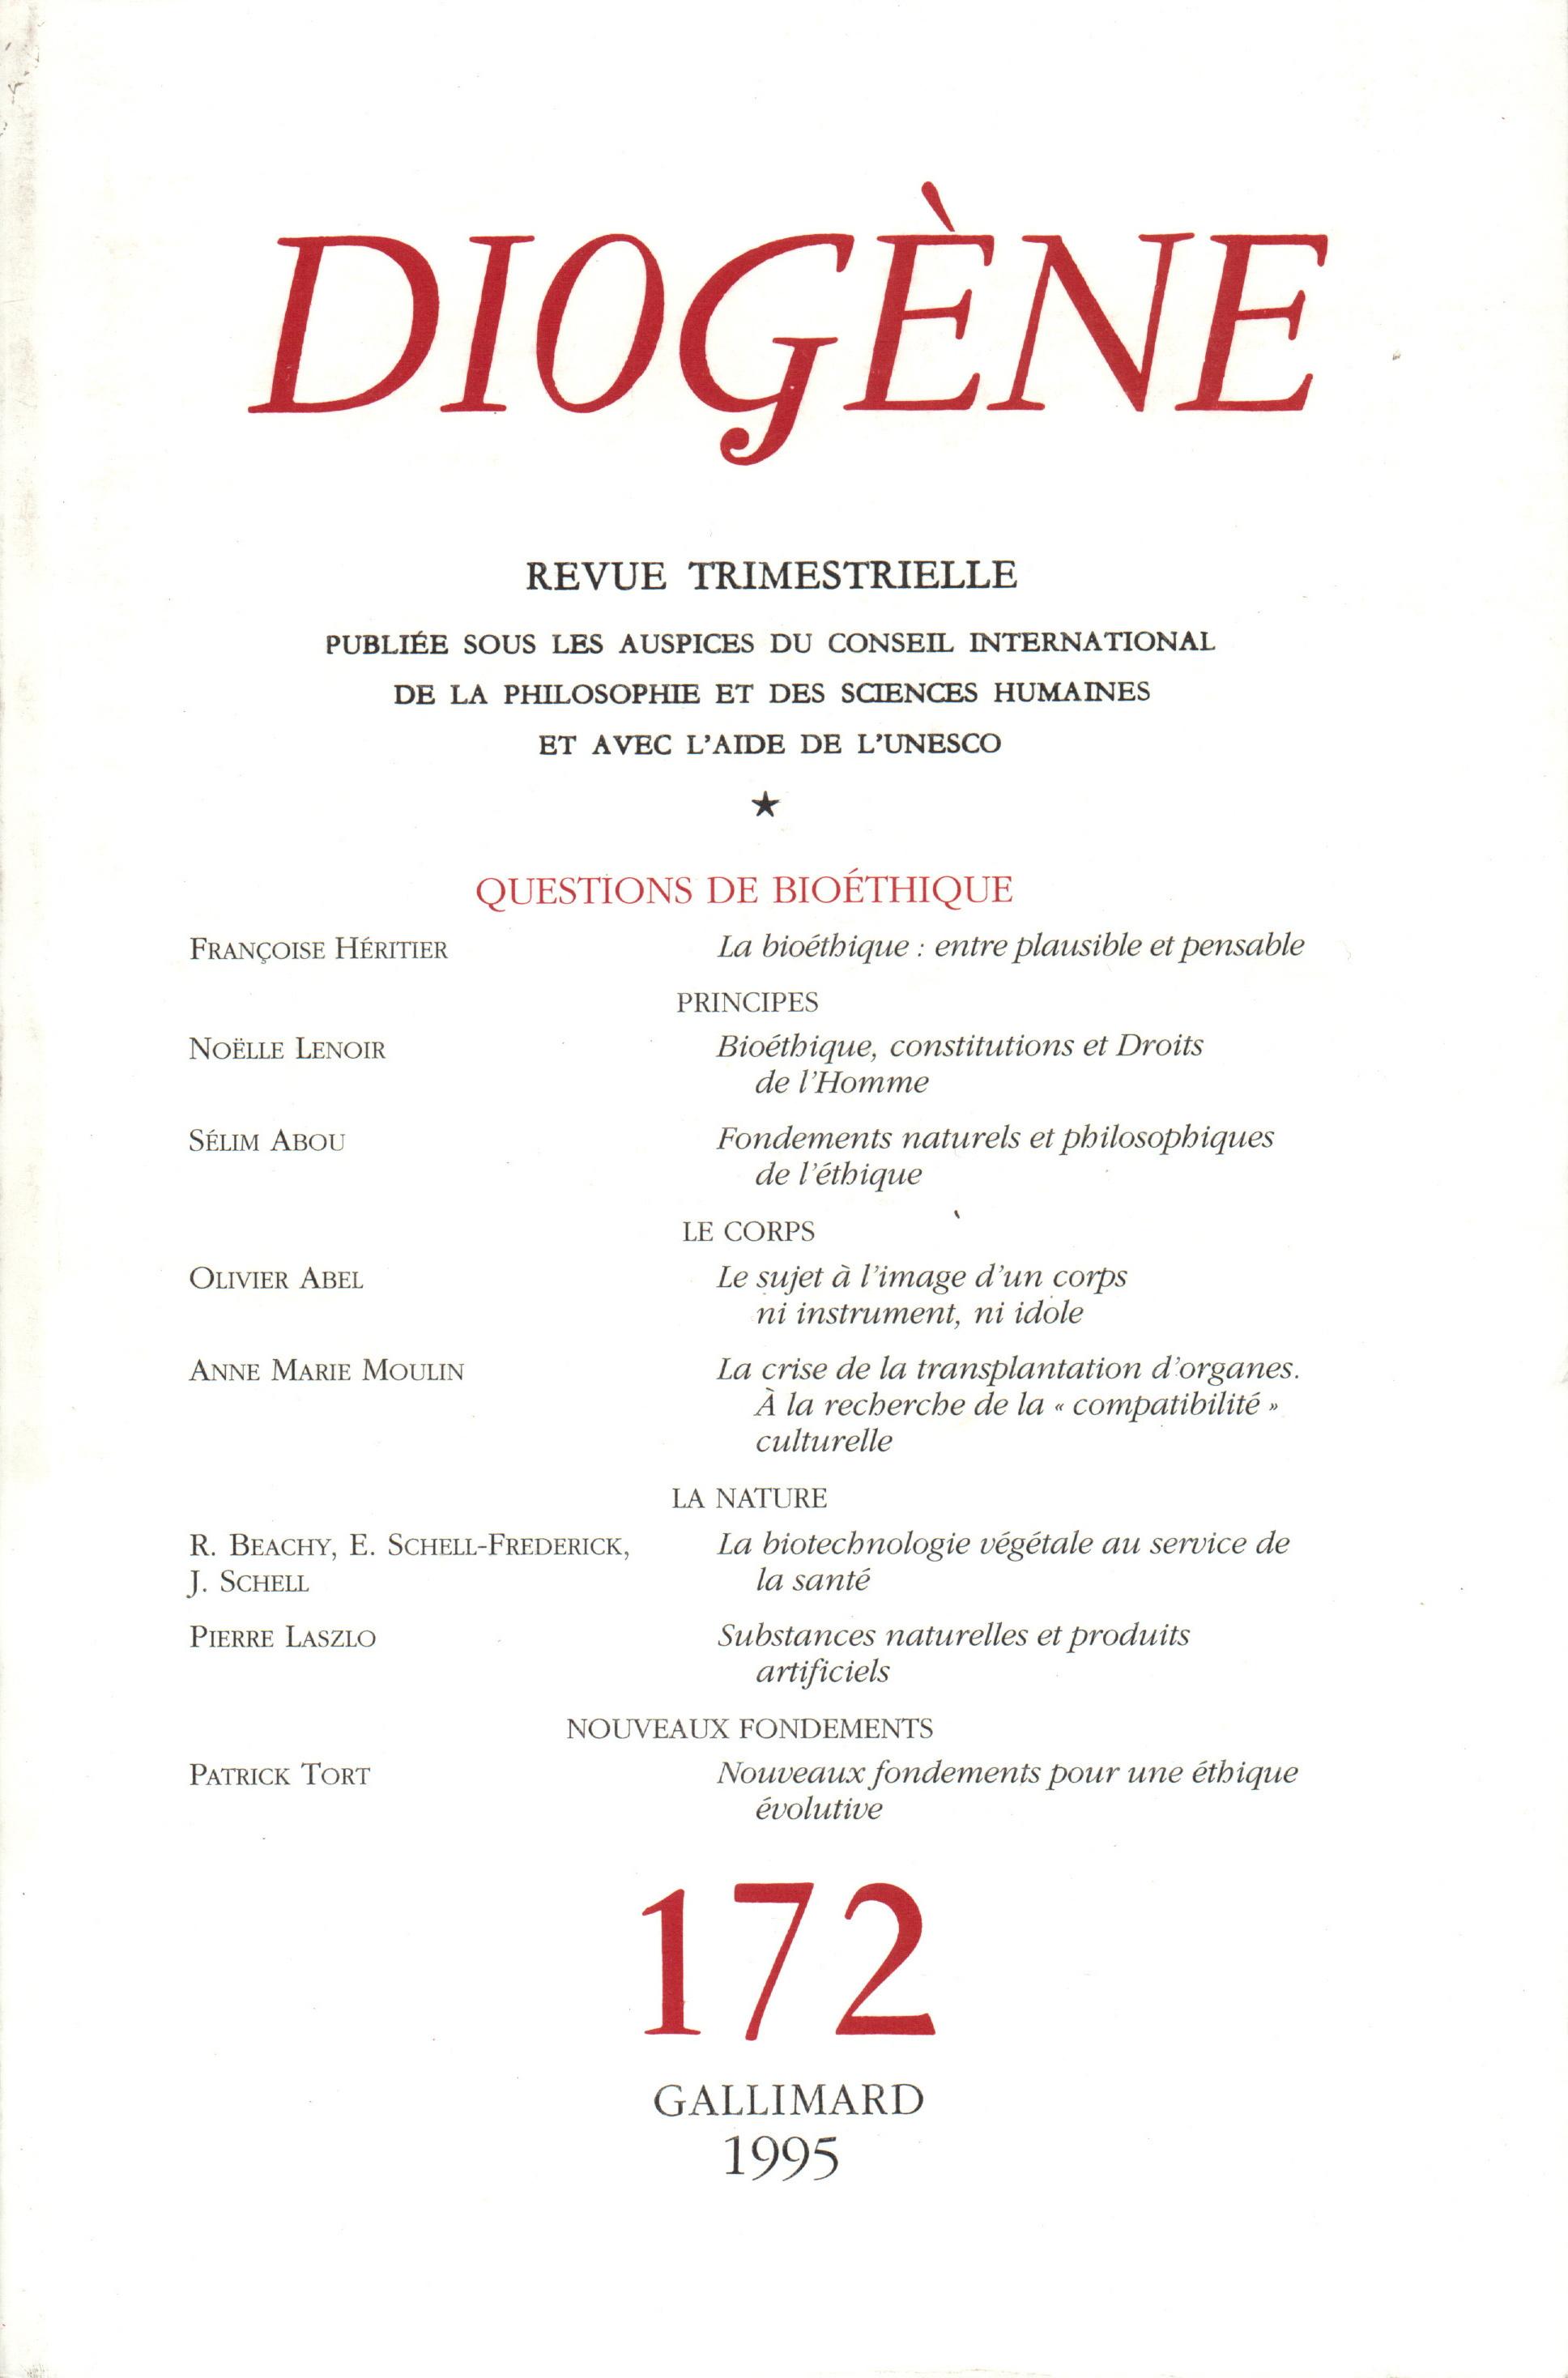 DIOGENE 172